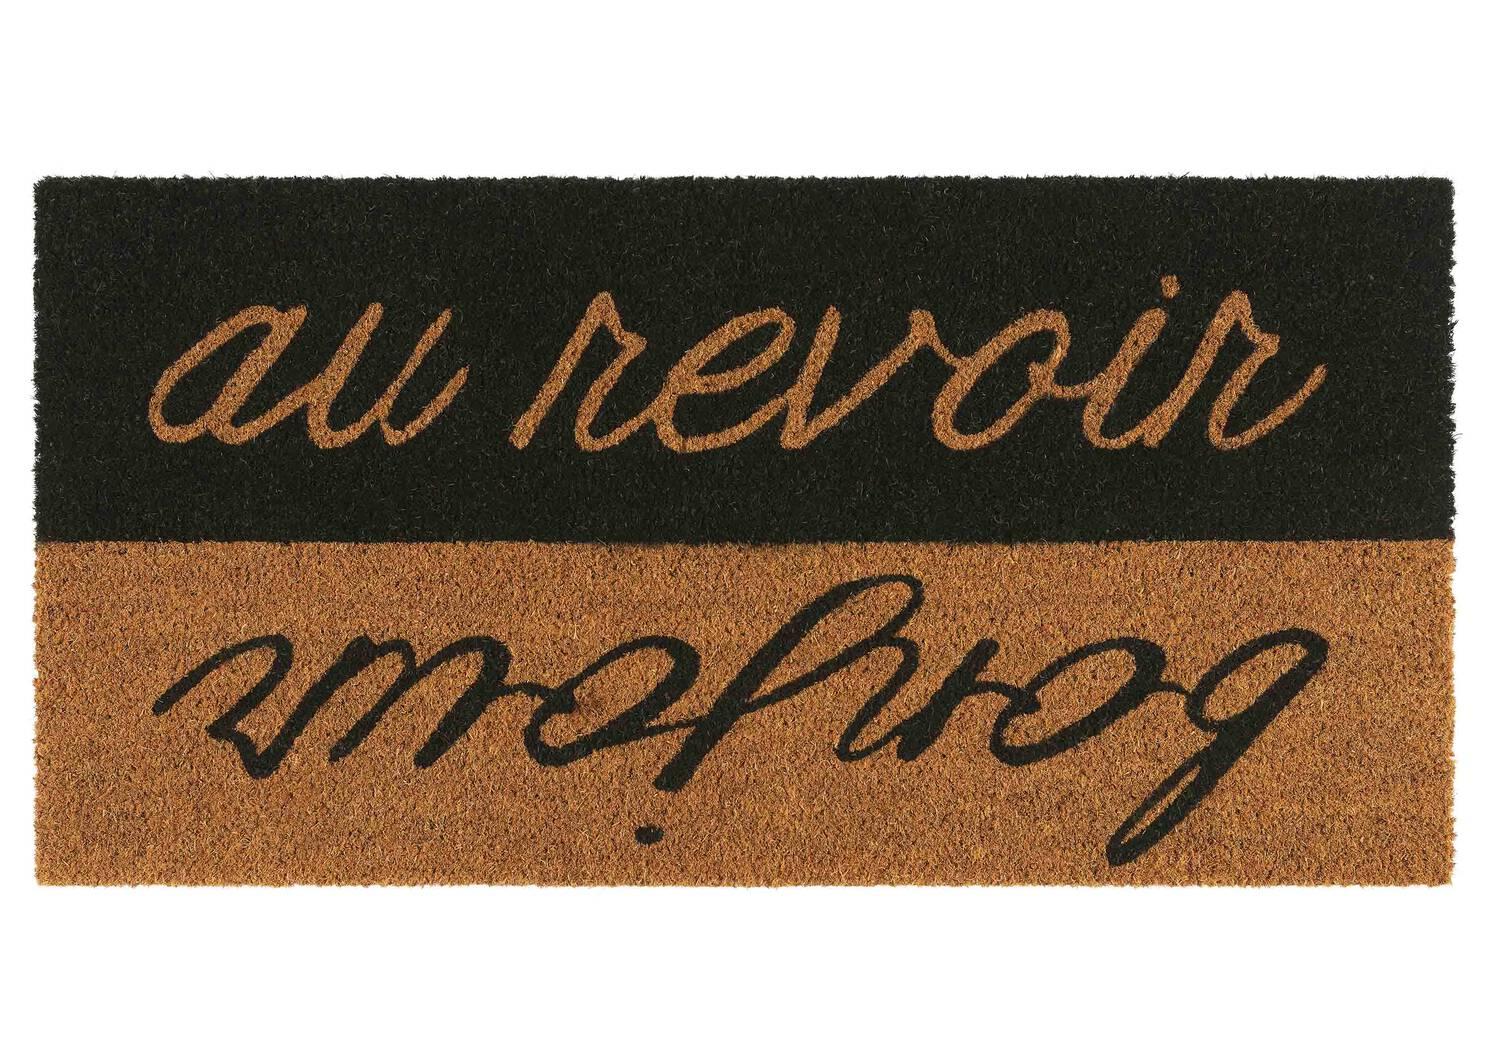 Bonjour Au Revoir Doormat Grey/Natura